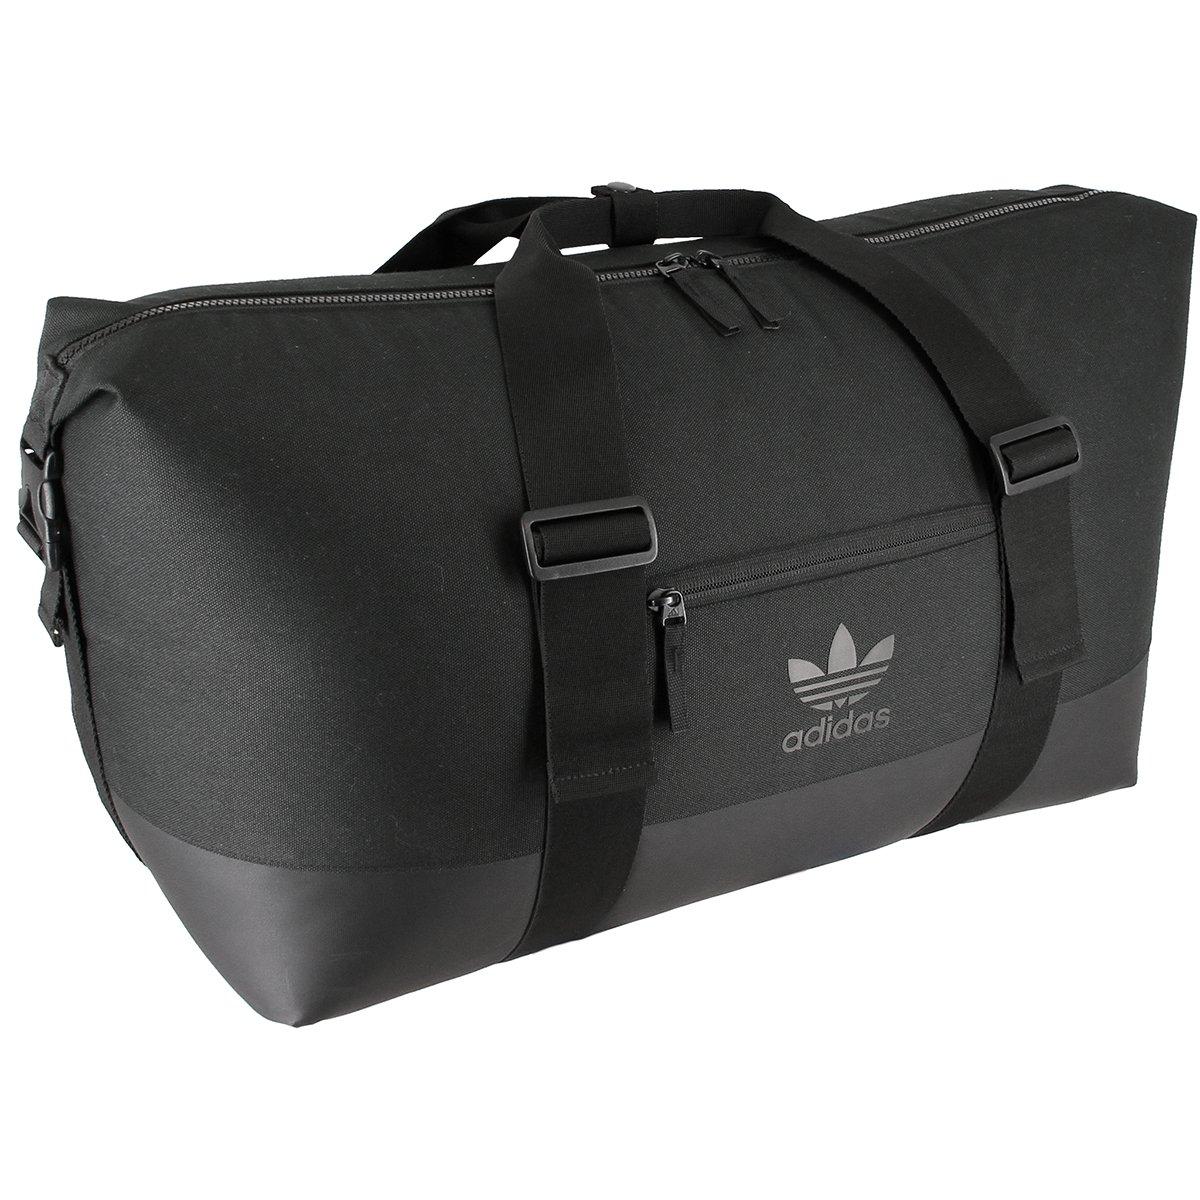 df3573c7eb adidas Unisex Originals Weekender Duffel Bag